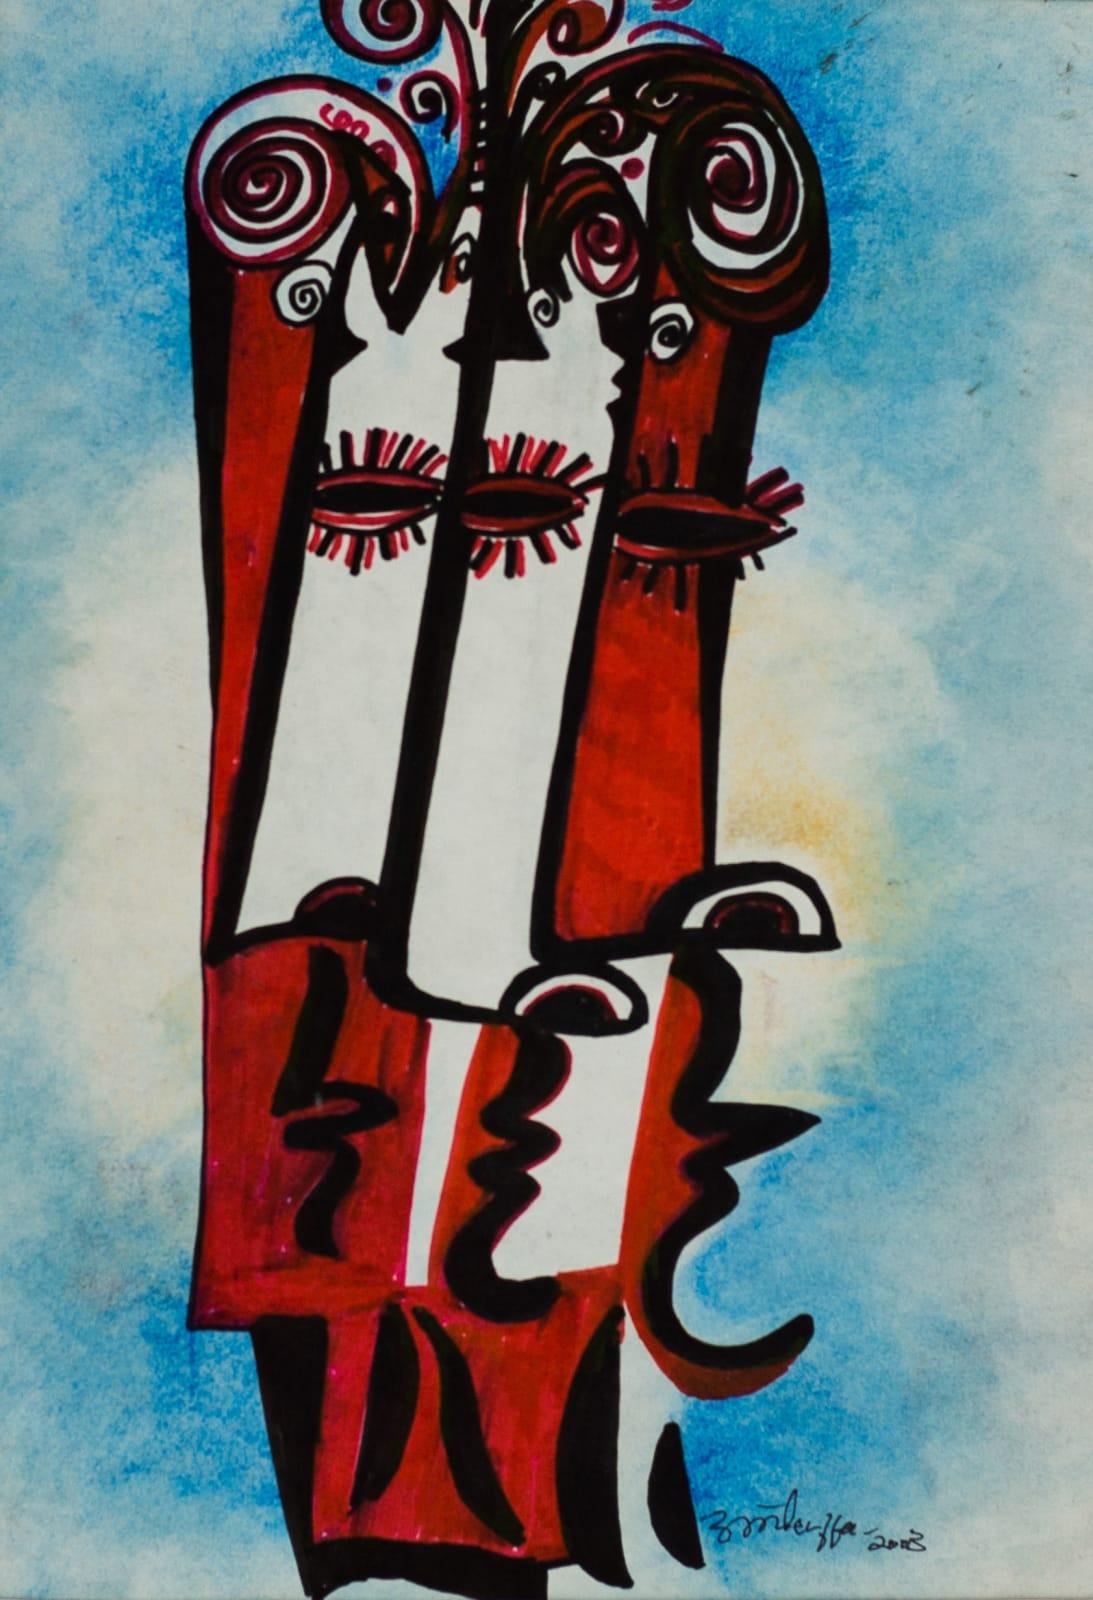 Tibebe Terffa , Untitled on Paper IV, 2003